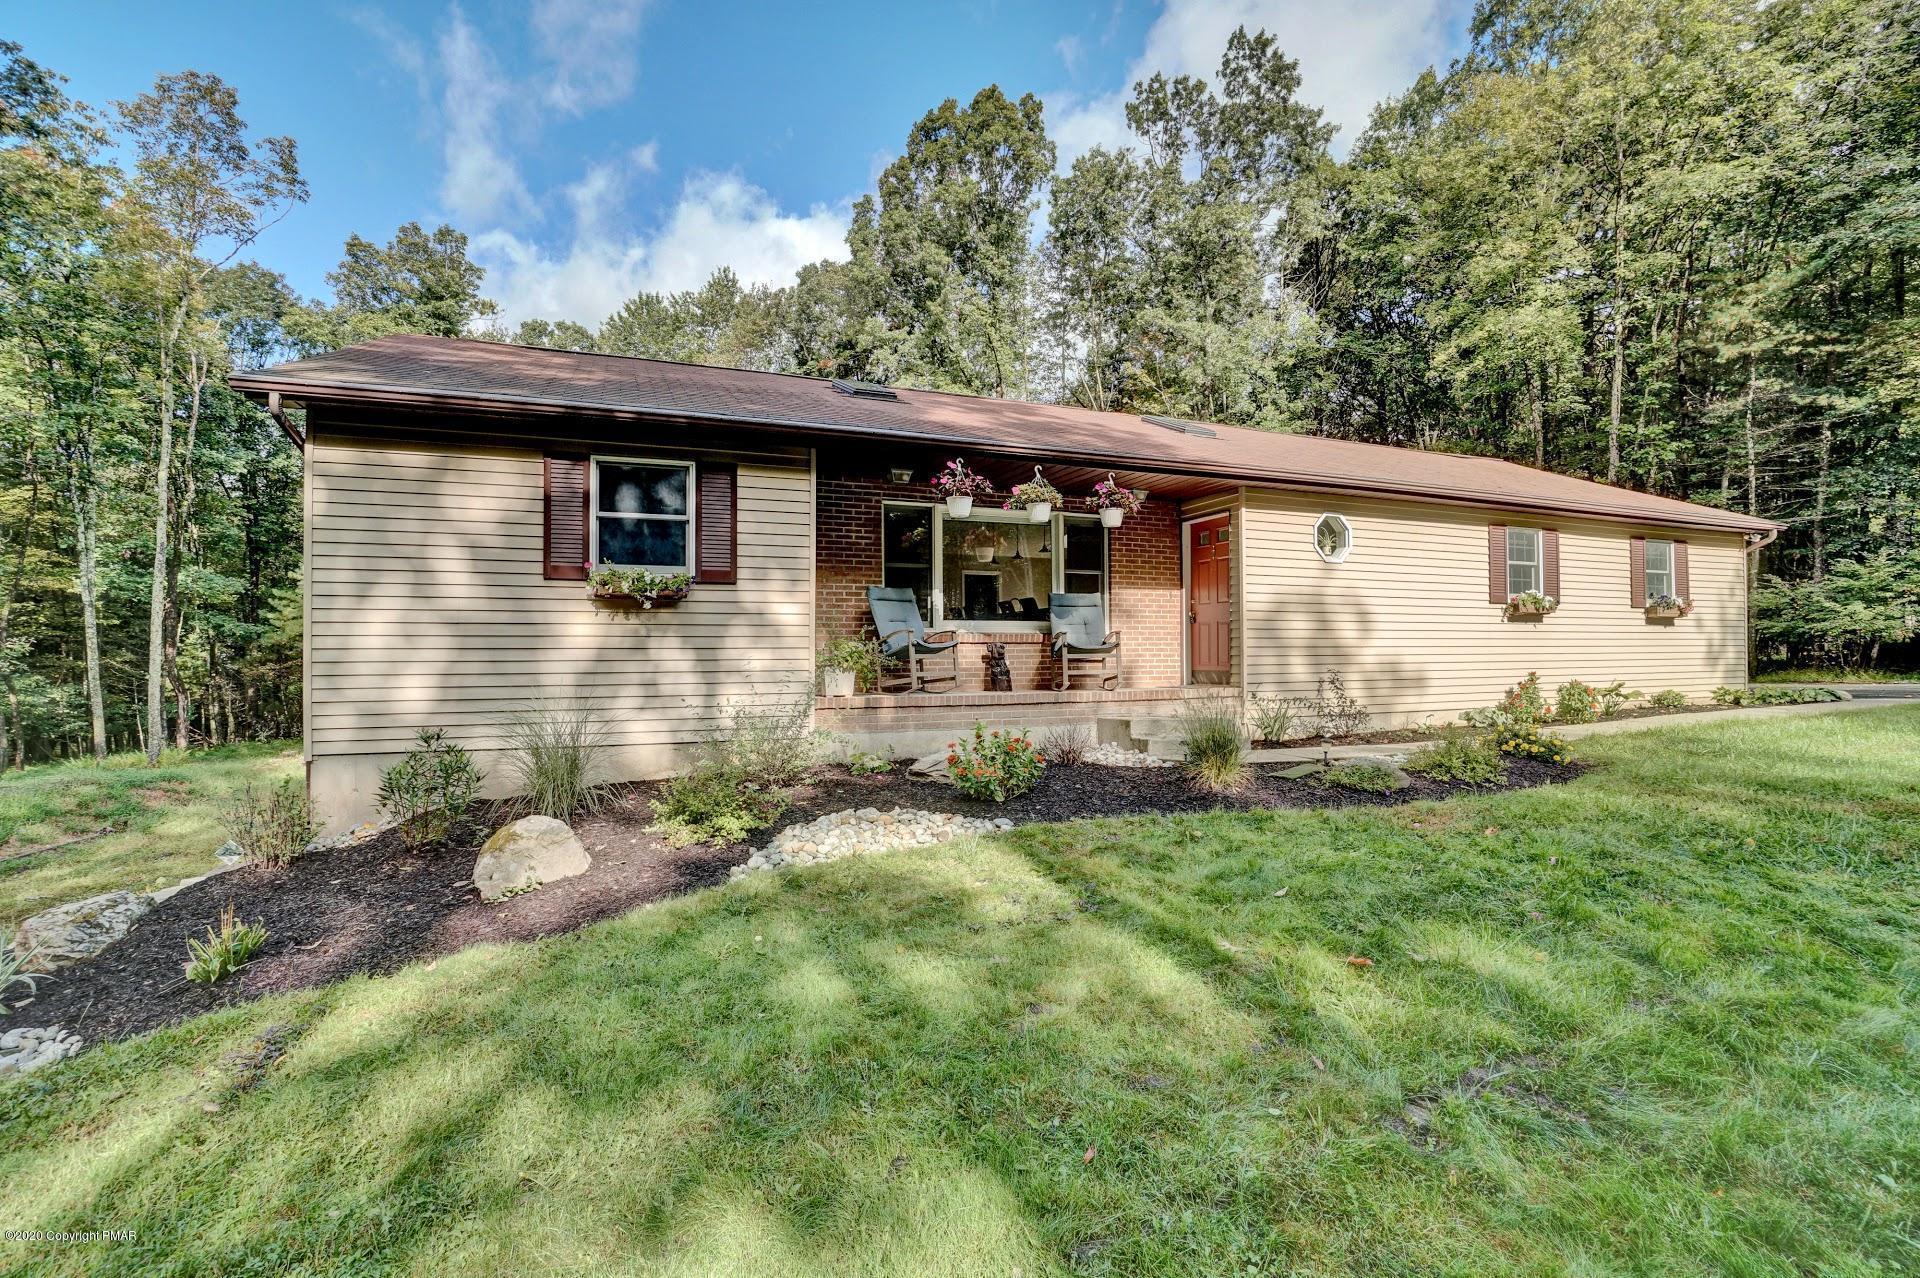 820 Elmwood Ct, Saylorsburg, PA 18353